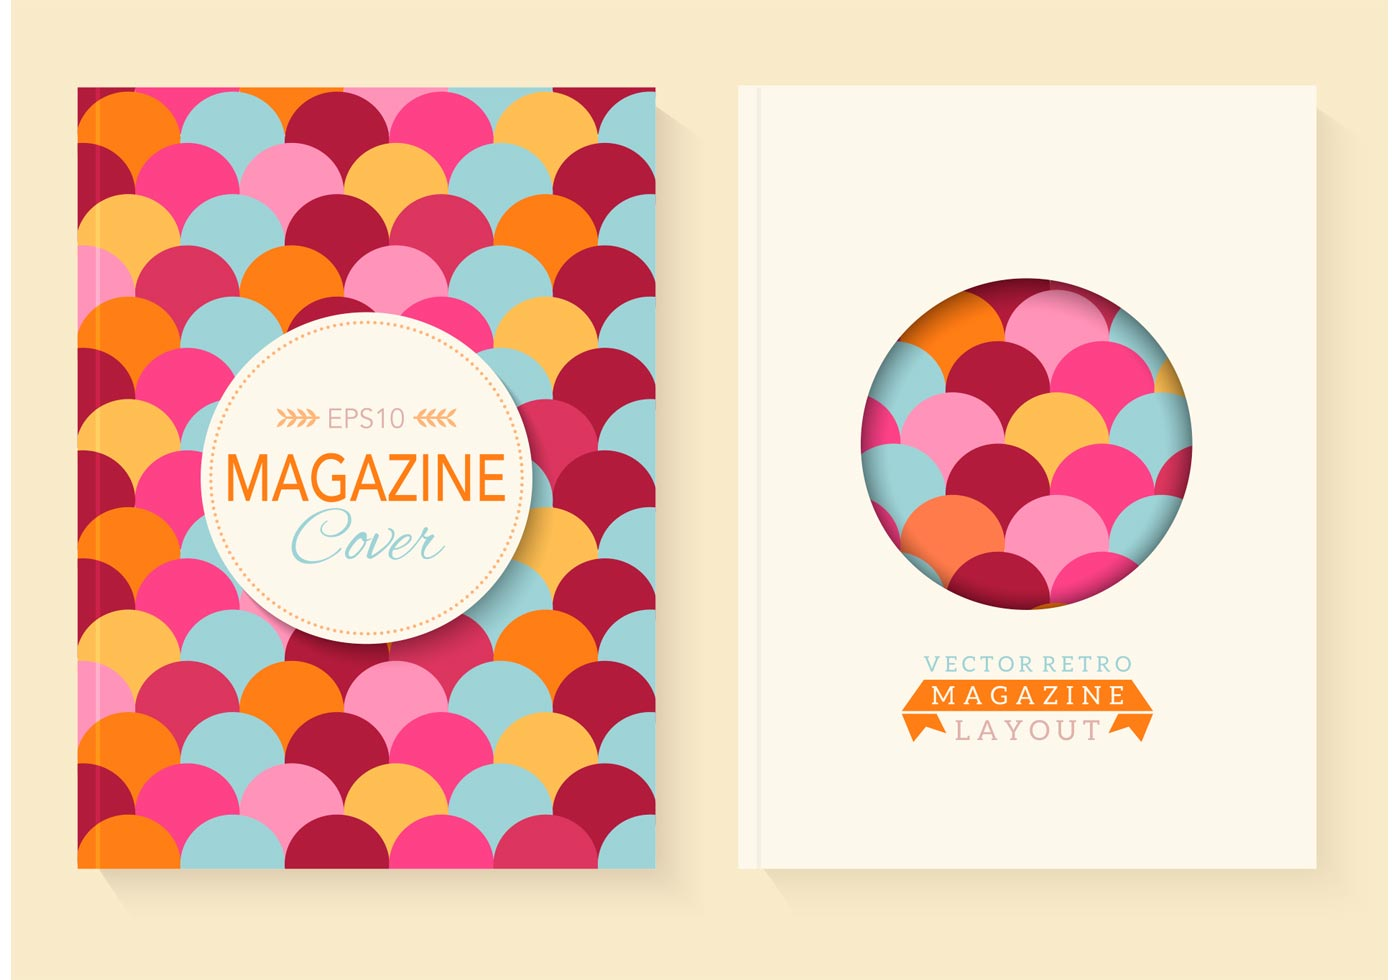 Kostenlose Retro Magazin Vector Covers - Kostenlose Vektor-Kunst ...